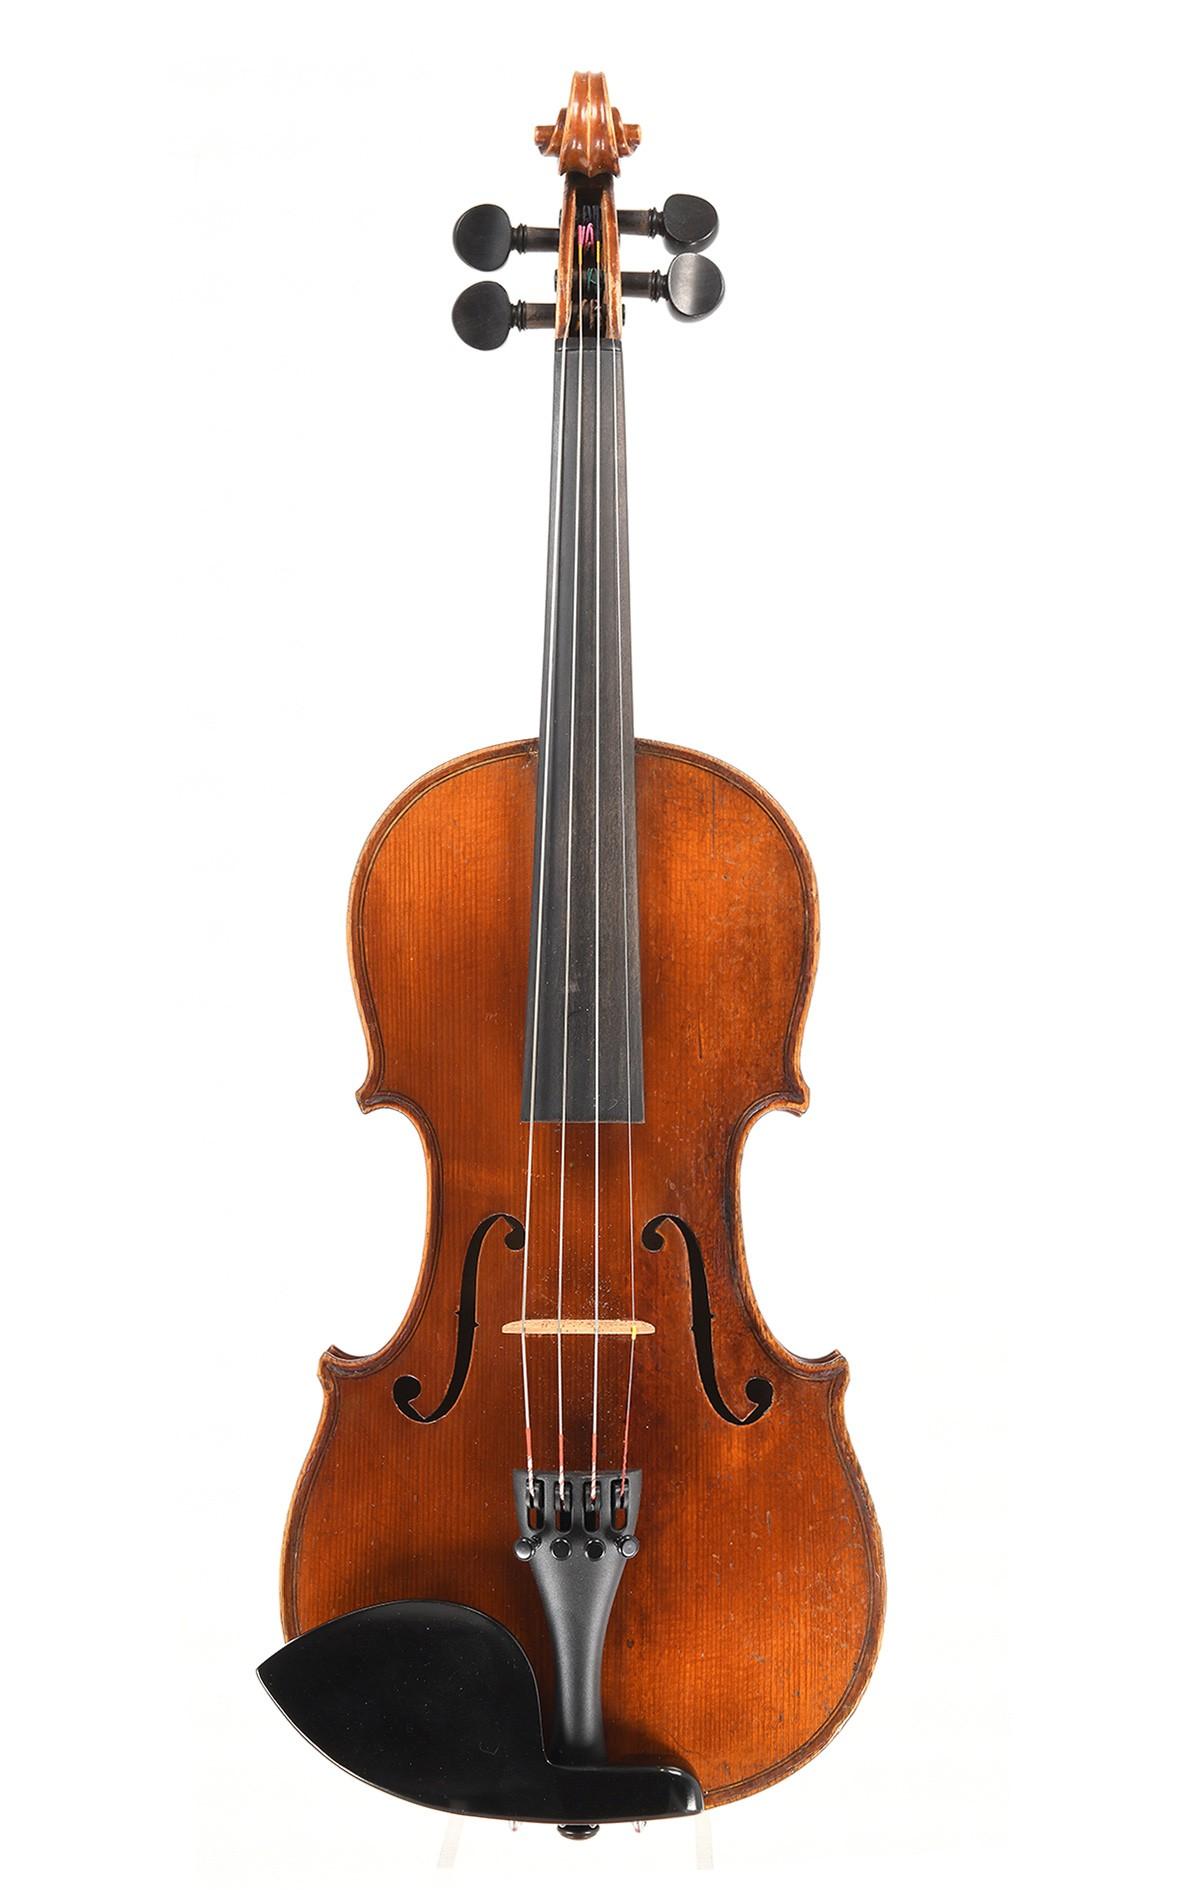 3/4 Geige vin Neuner & Hornsteiner